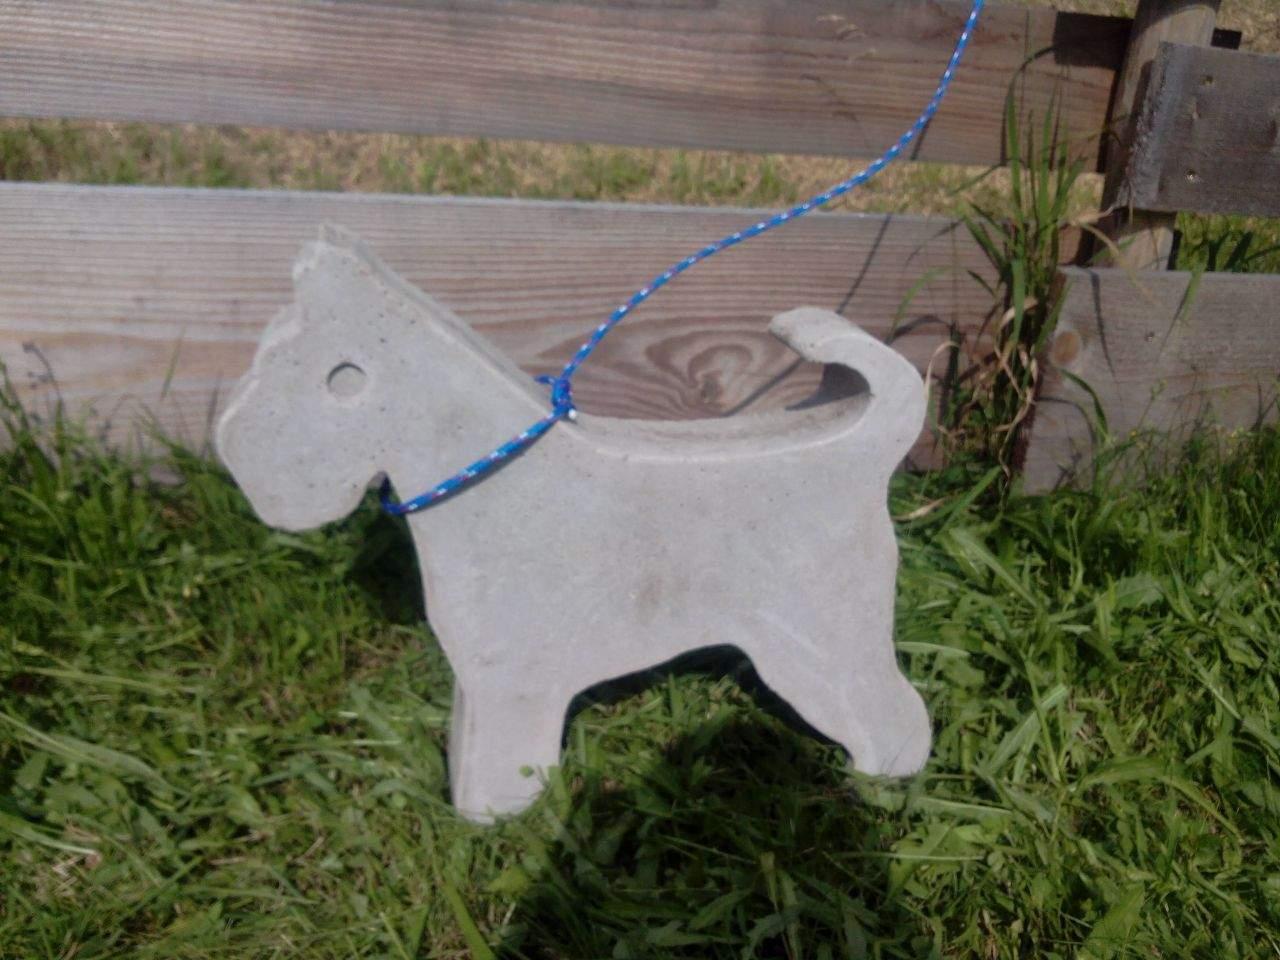 beton deko garten neu ein beton hund zum geburtstag bauanleitung zum selberbauen of beton deko garten